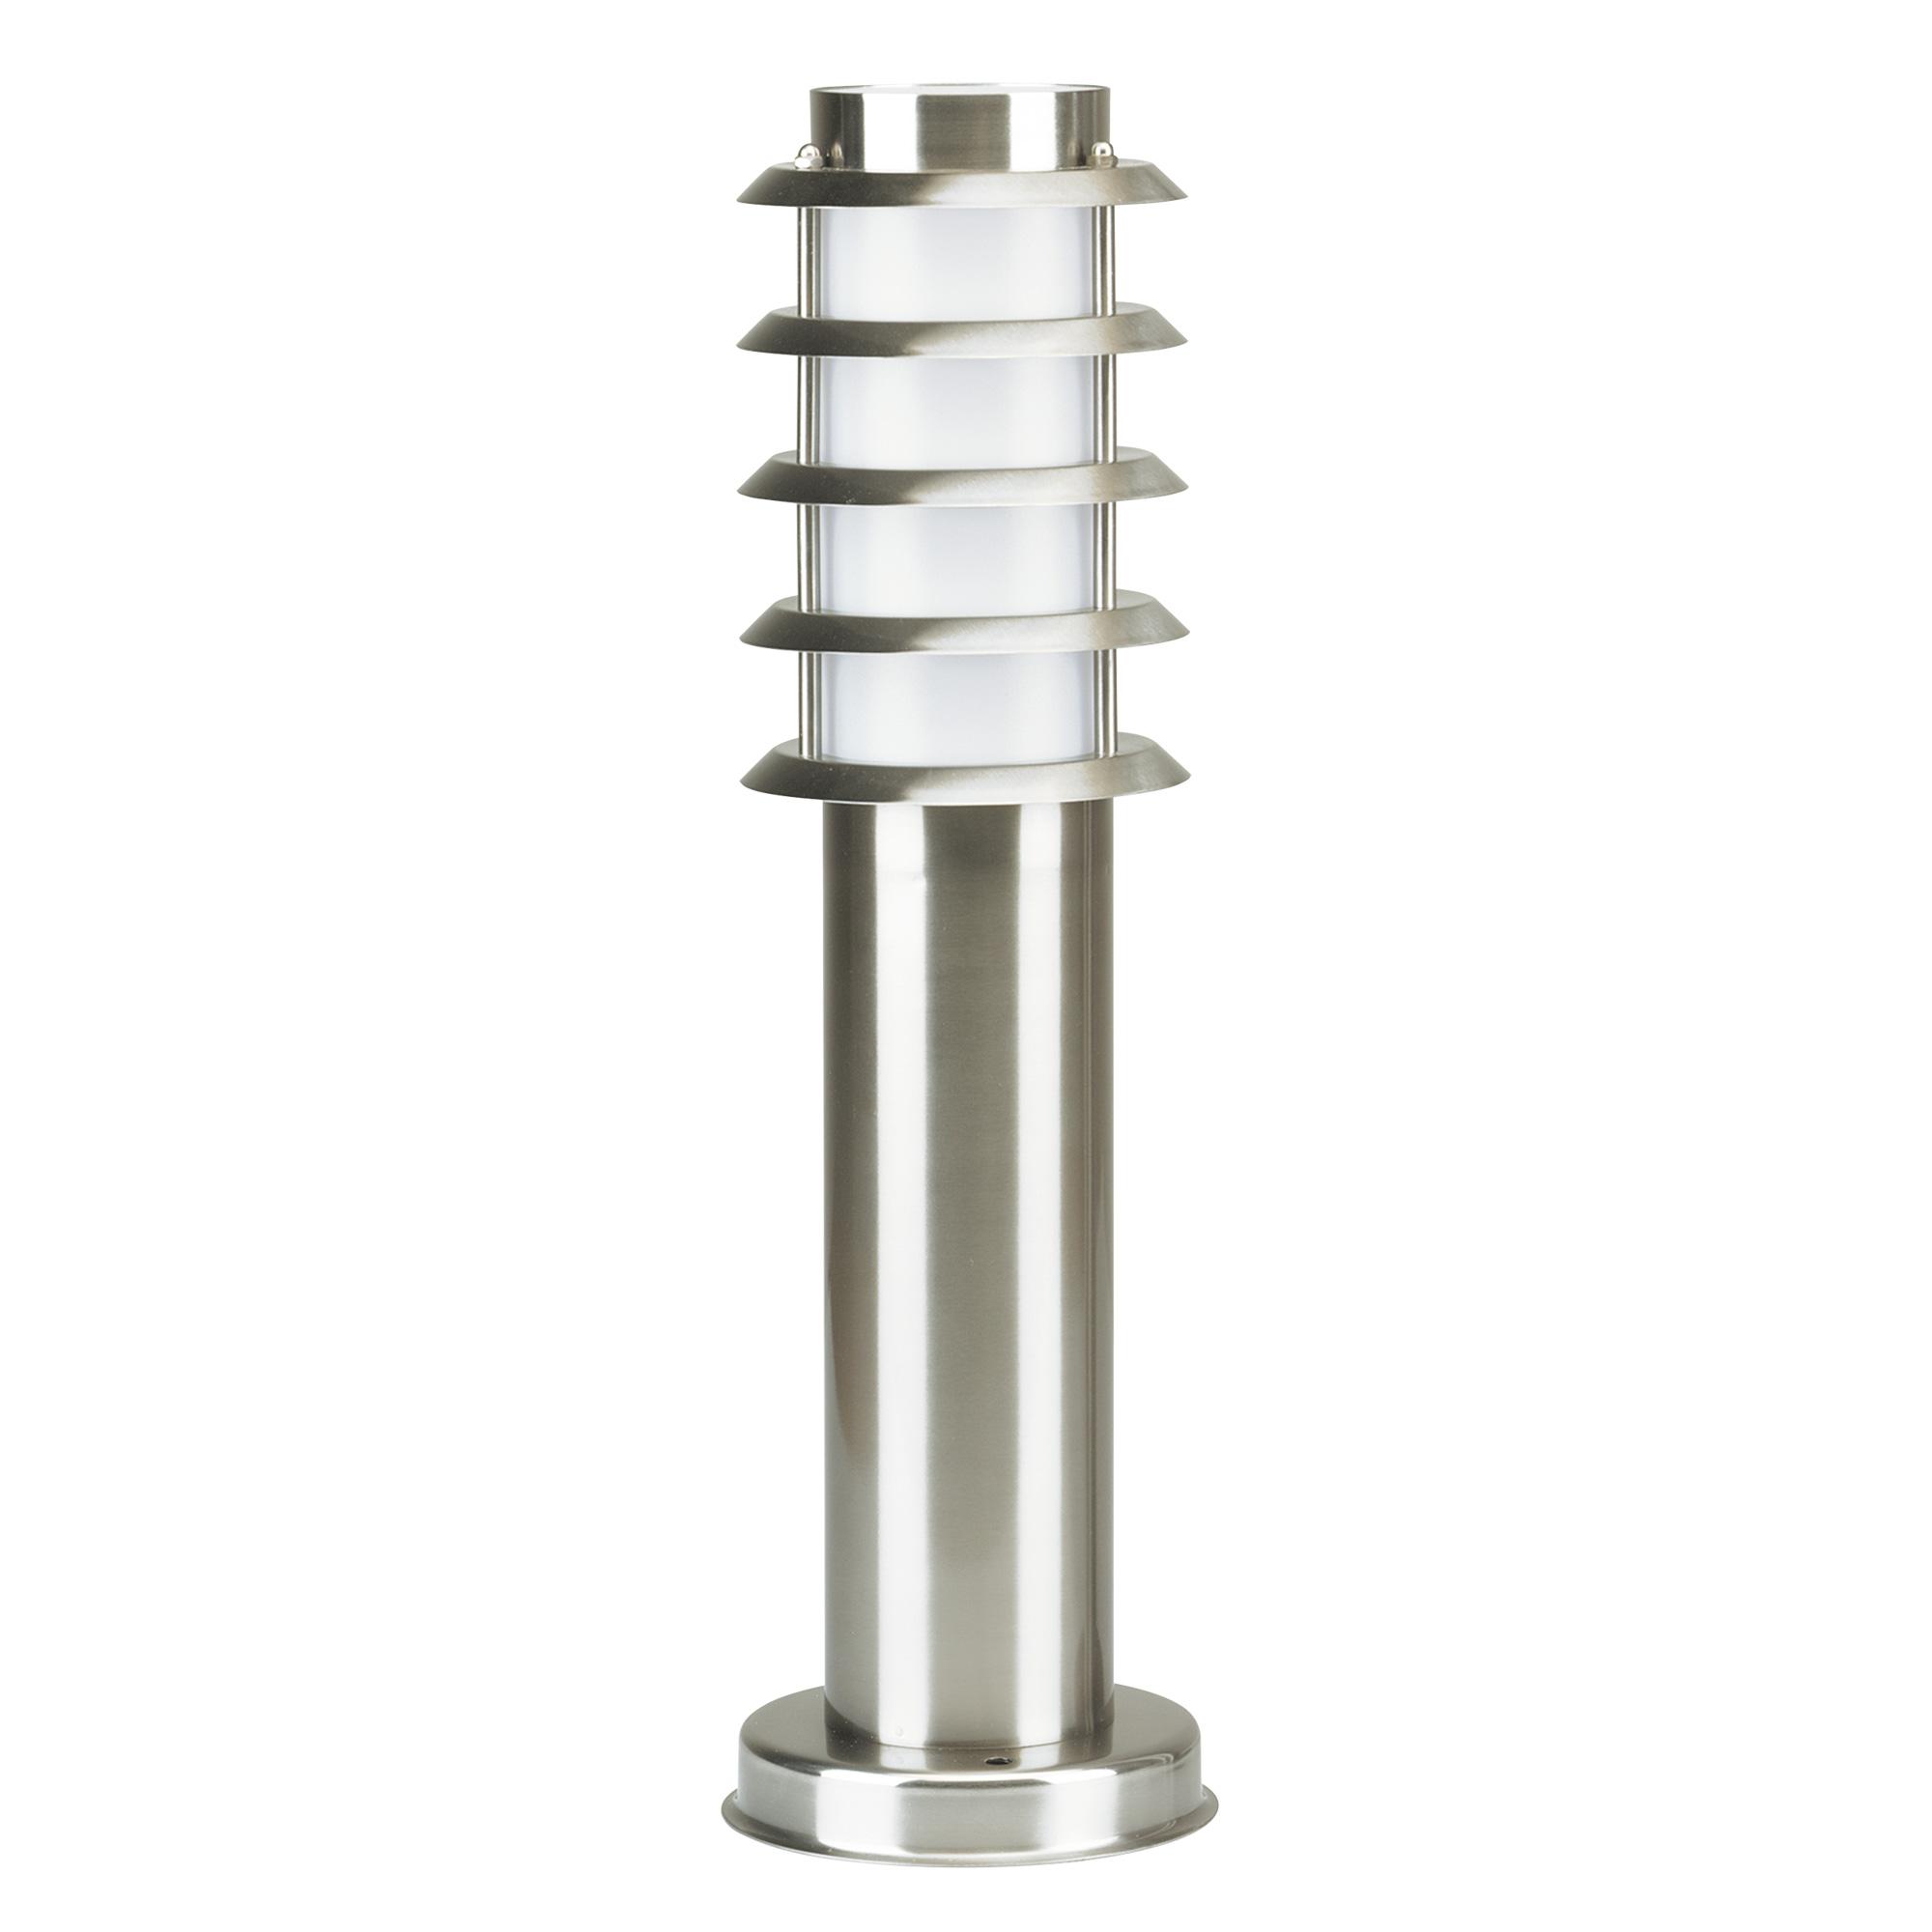 Soll 3 RVS Tuinlamp